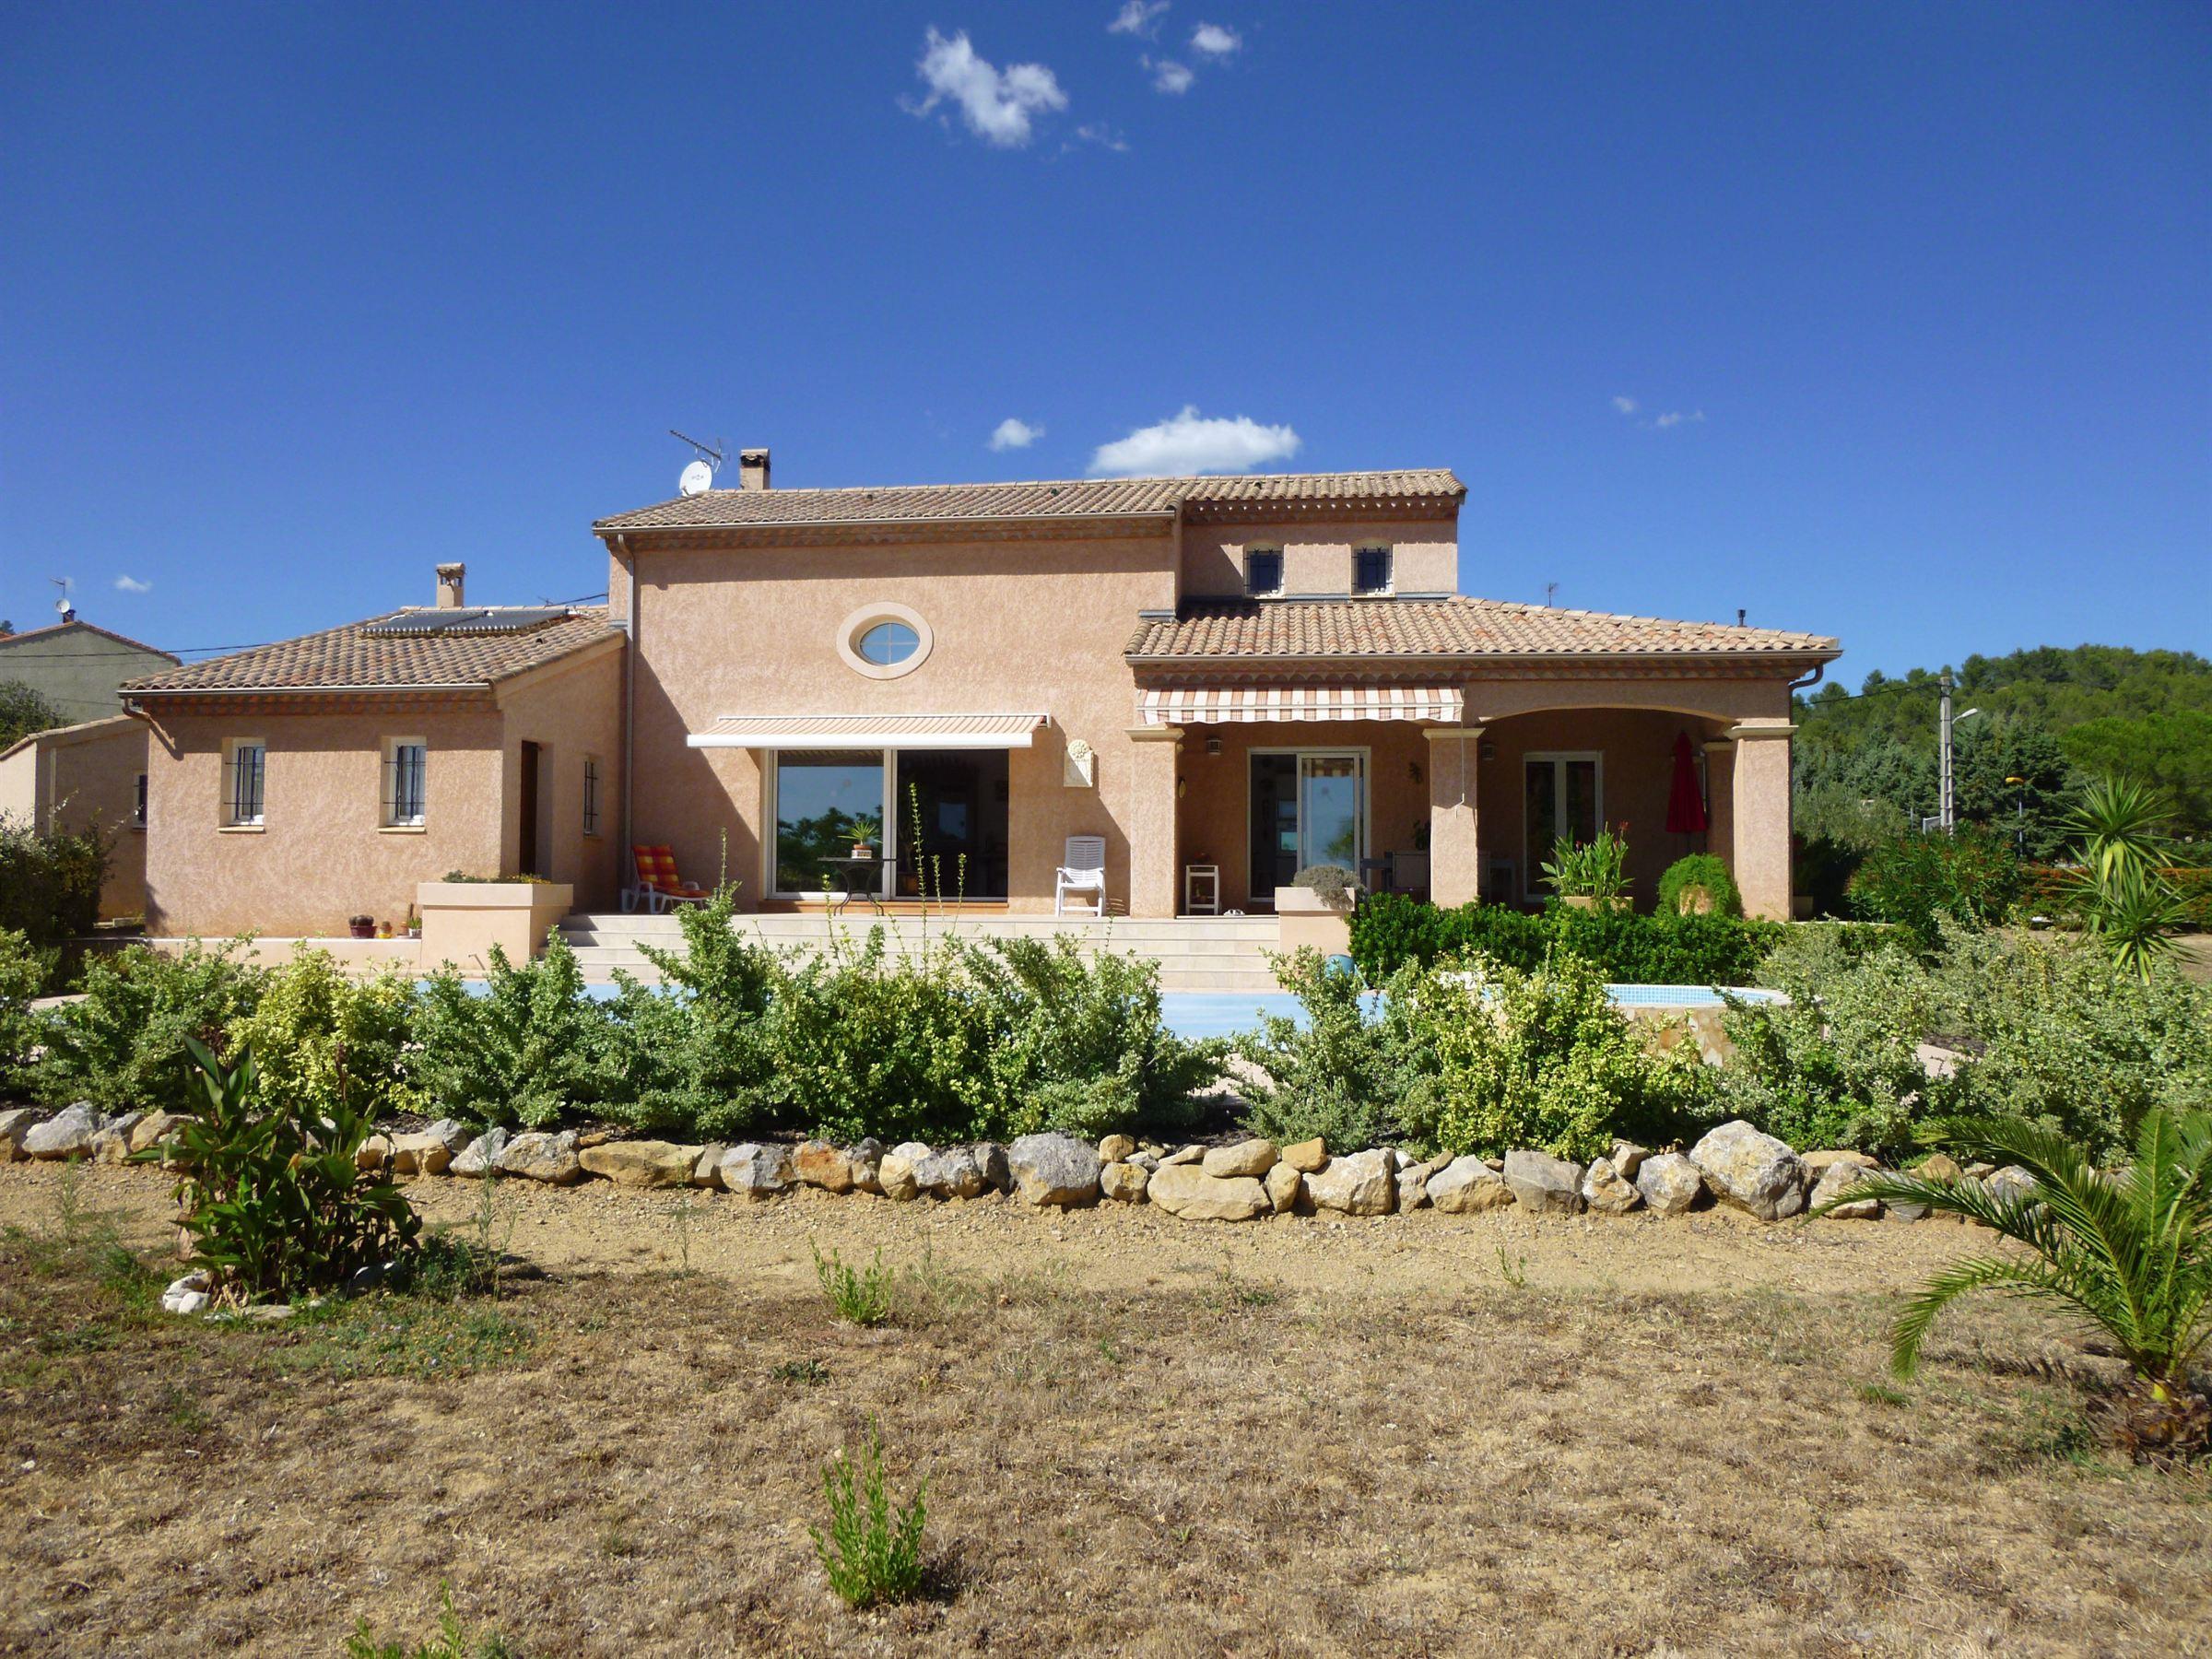 Single Family Home for Sale at Belle villa d'architecte Narbonne, Languedoc-Roussillon, 11100 France